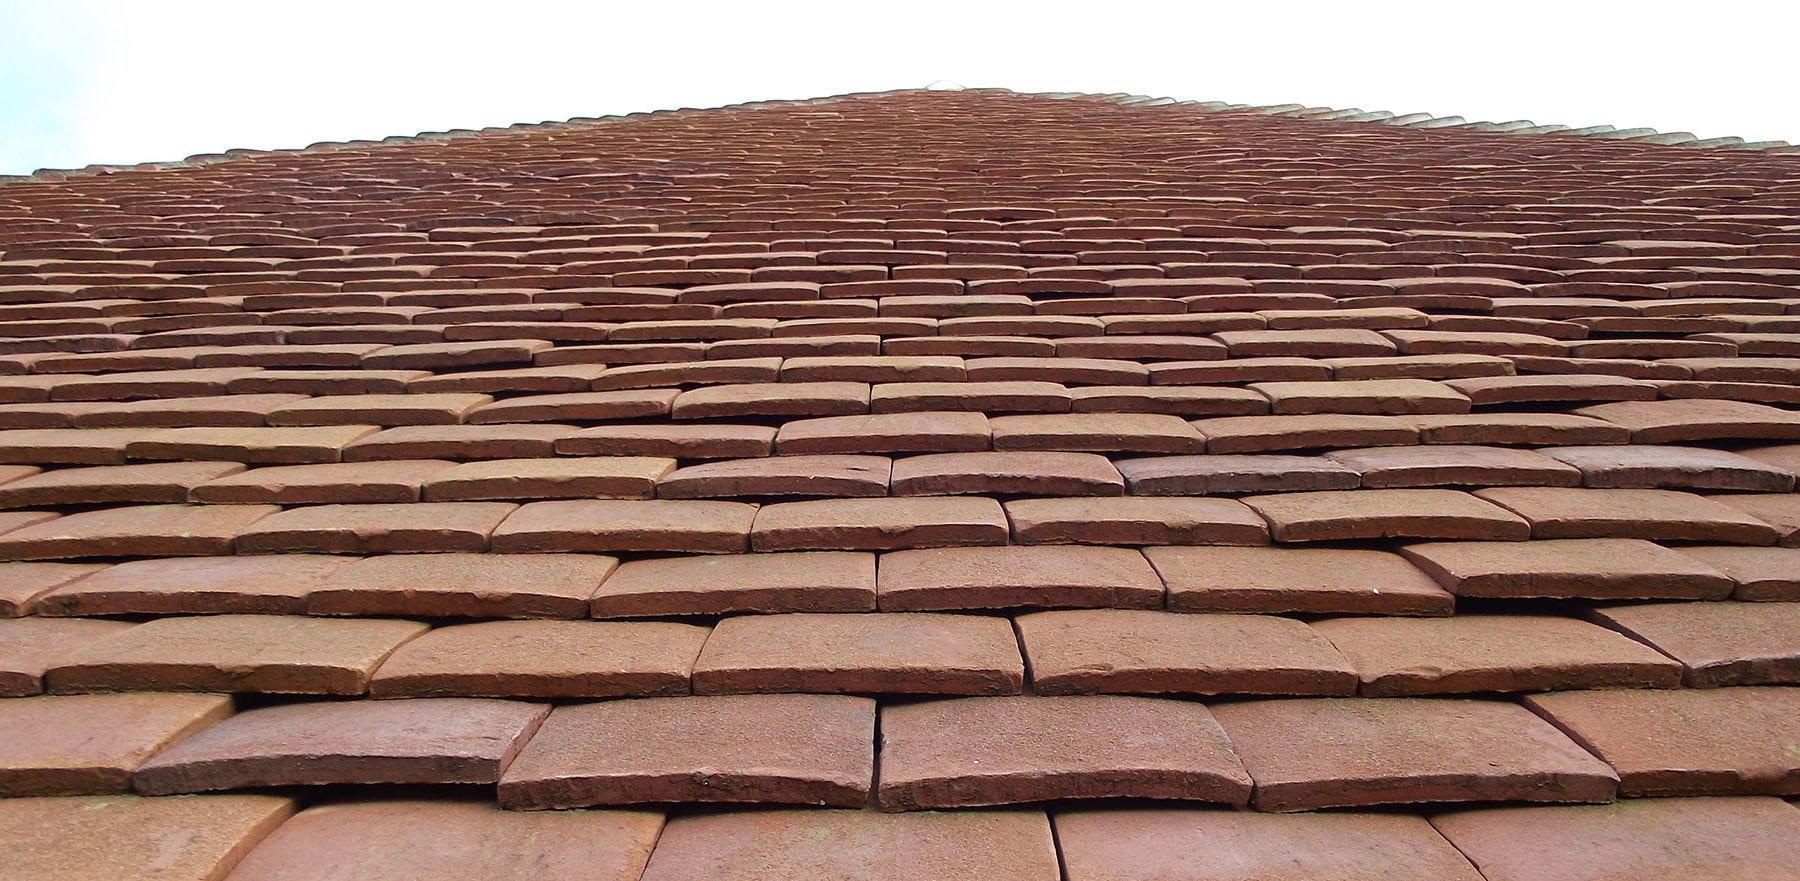 Lifestiles - Handmade Orange Clay Roof Tiles - Baughurst, England 8